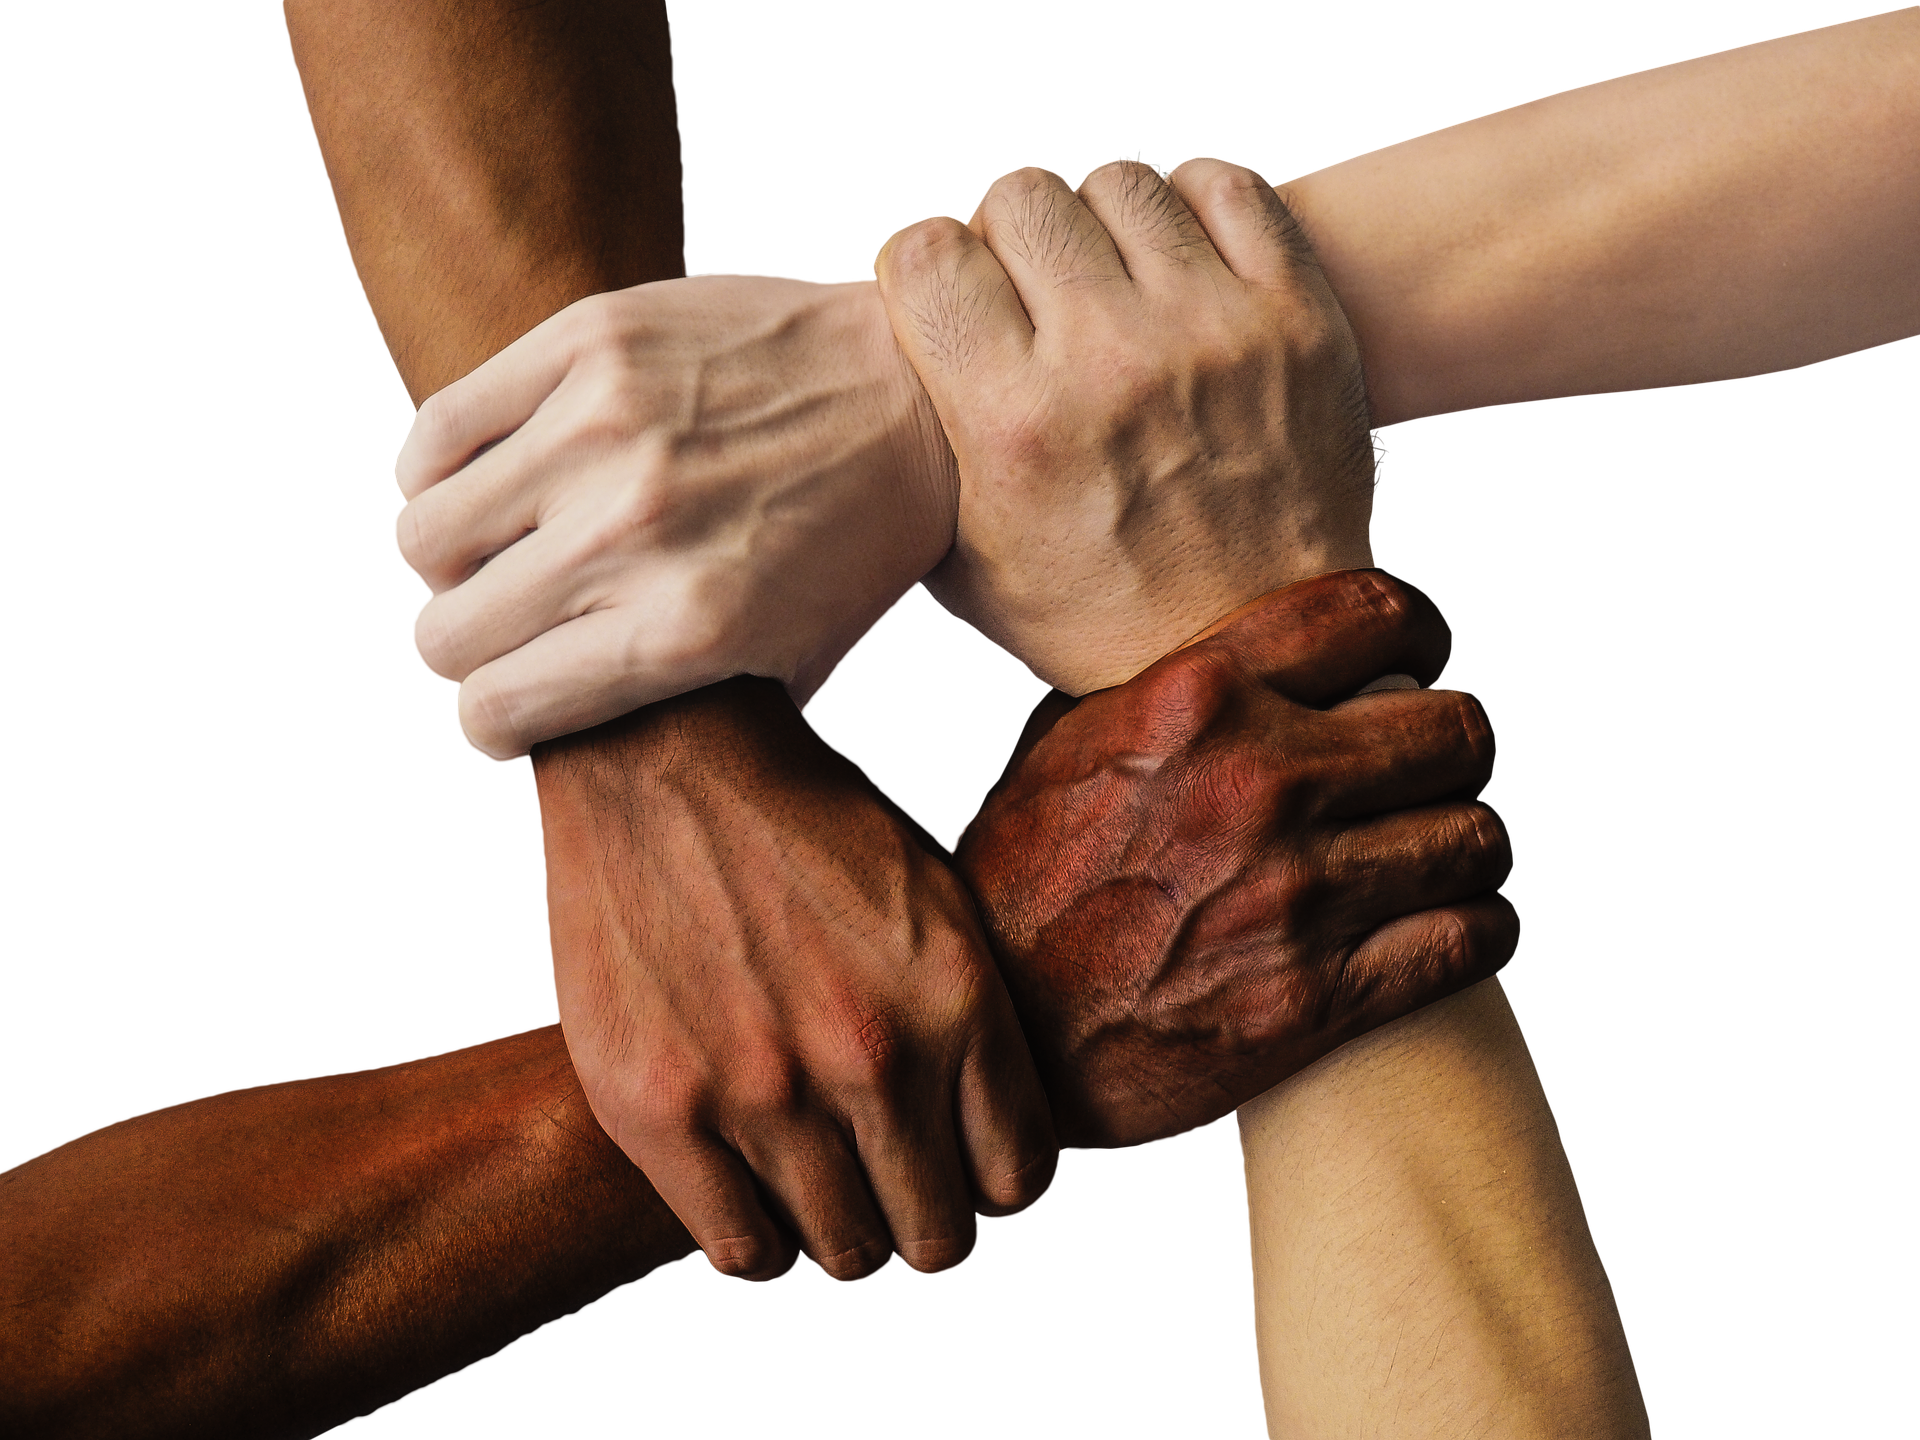 ·.¸¸.·♩♪♫ 💕 Amizade Sem Fronteira 💕 ♫♪♩·.¸¸.· Oficial | Chat | Bate Papo